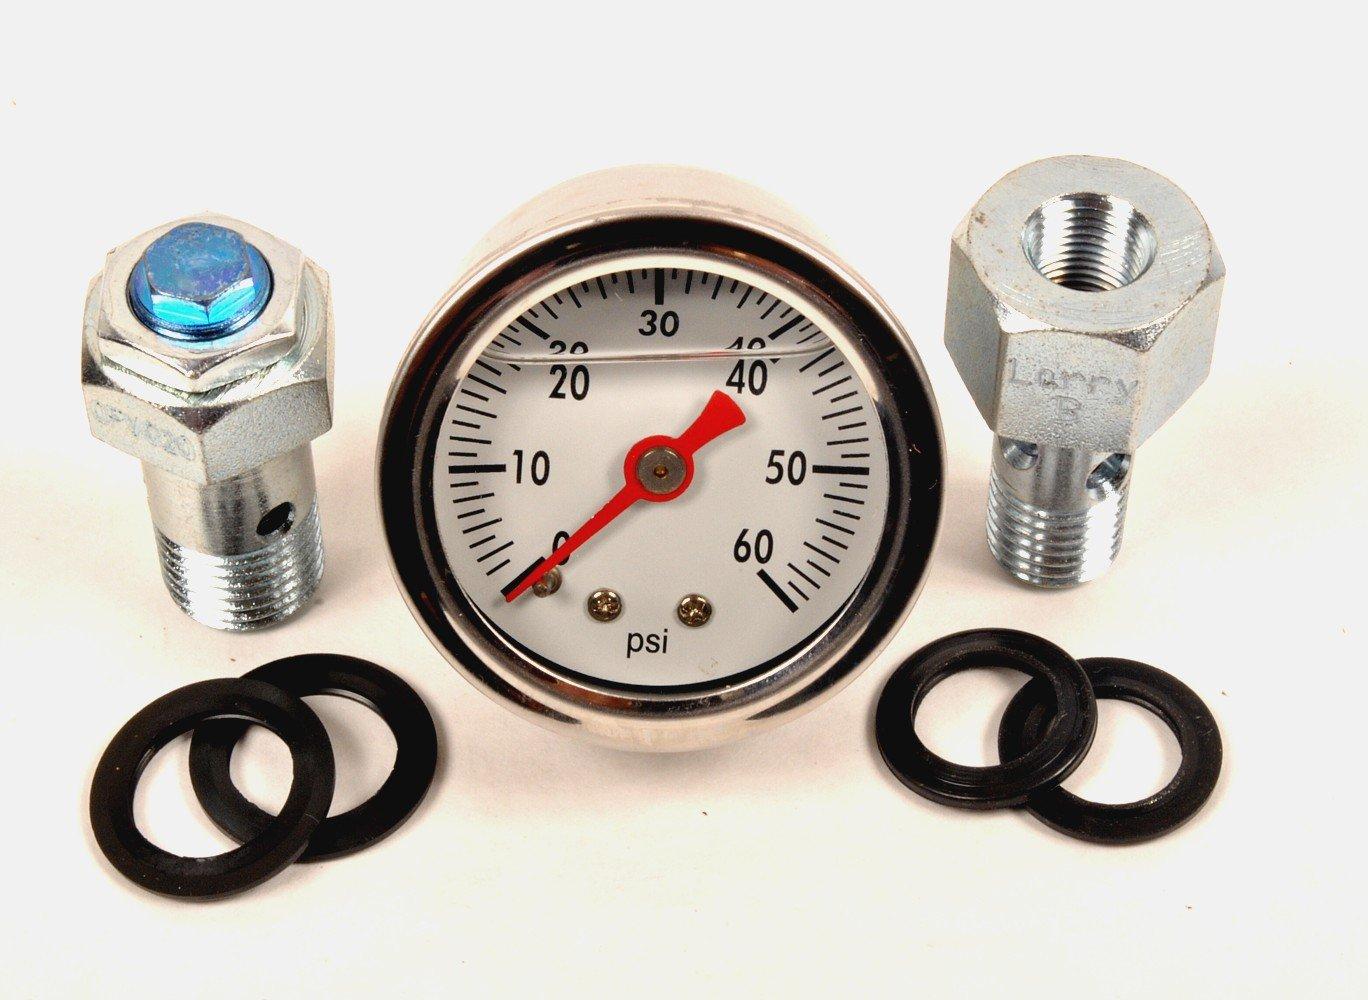 LarryB's Dodge Diesel, 94-98, Fuel Pressure Adjustment Kit LarryB' s Dodge Diesel